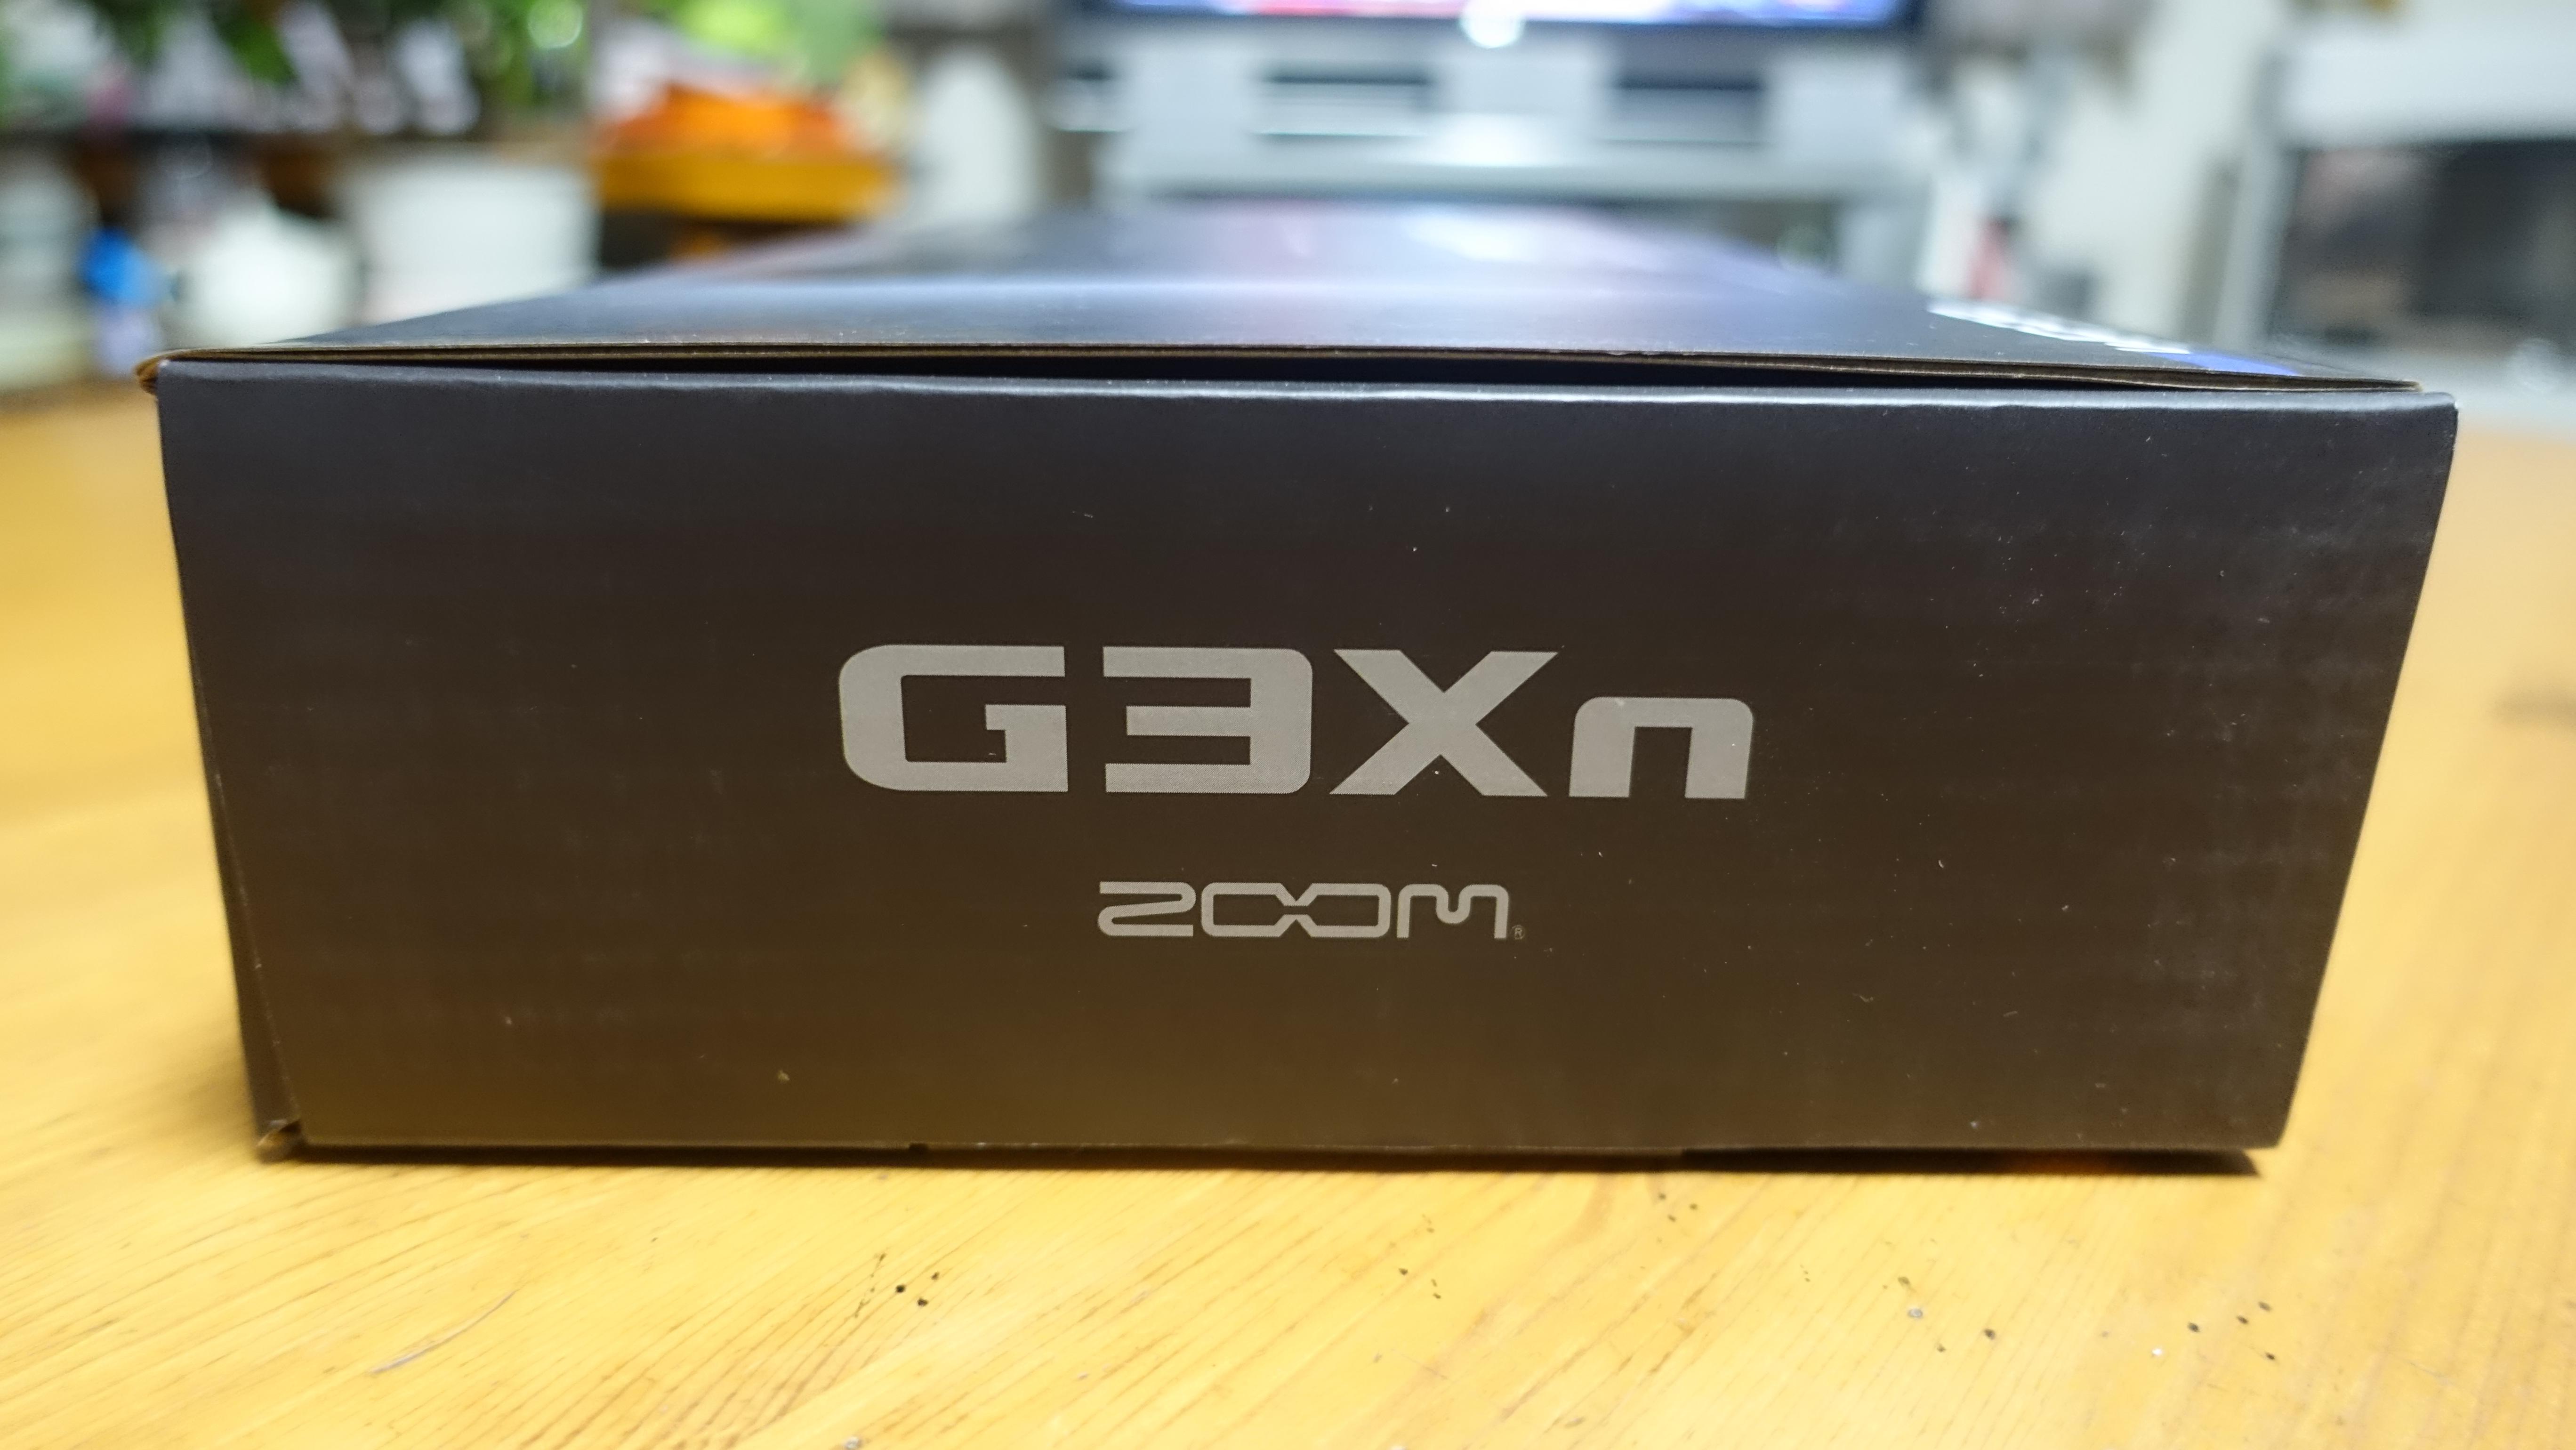 zoom-g3xn_03